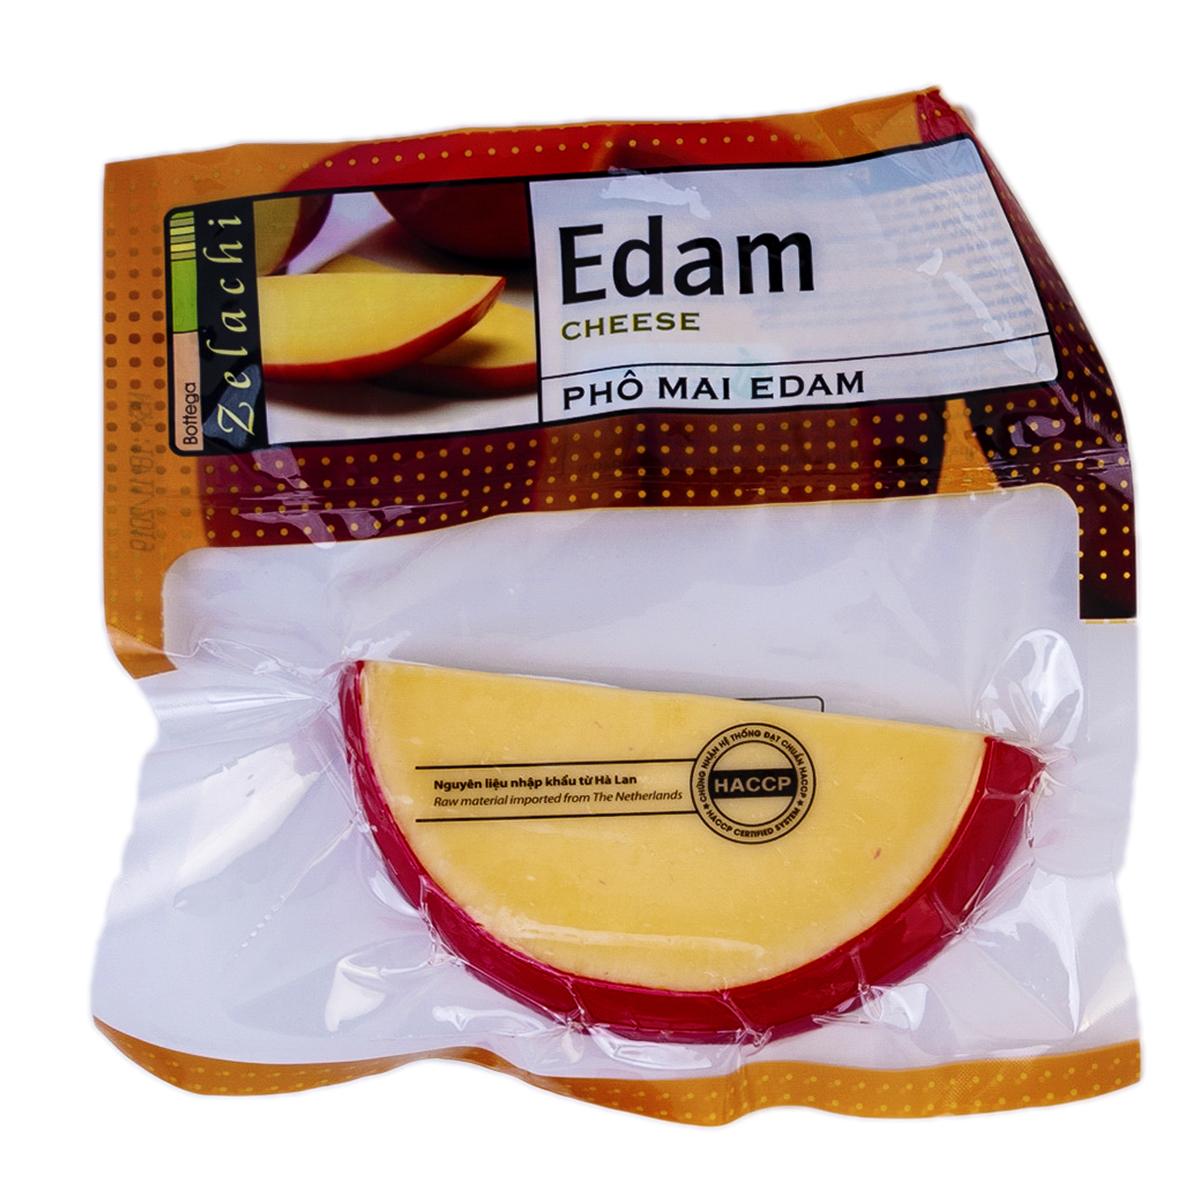 Cheese Edam Bottega Zelachi 100g - Phô mai Edam Bottega Zelachi 100g - Sản phẩm hữu cơ, nhập khẩu